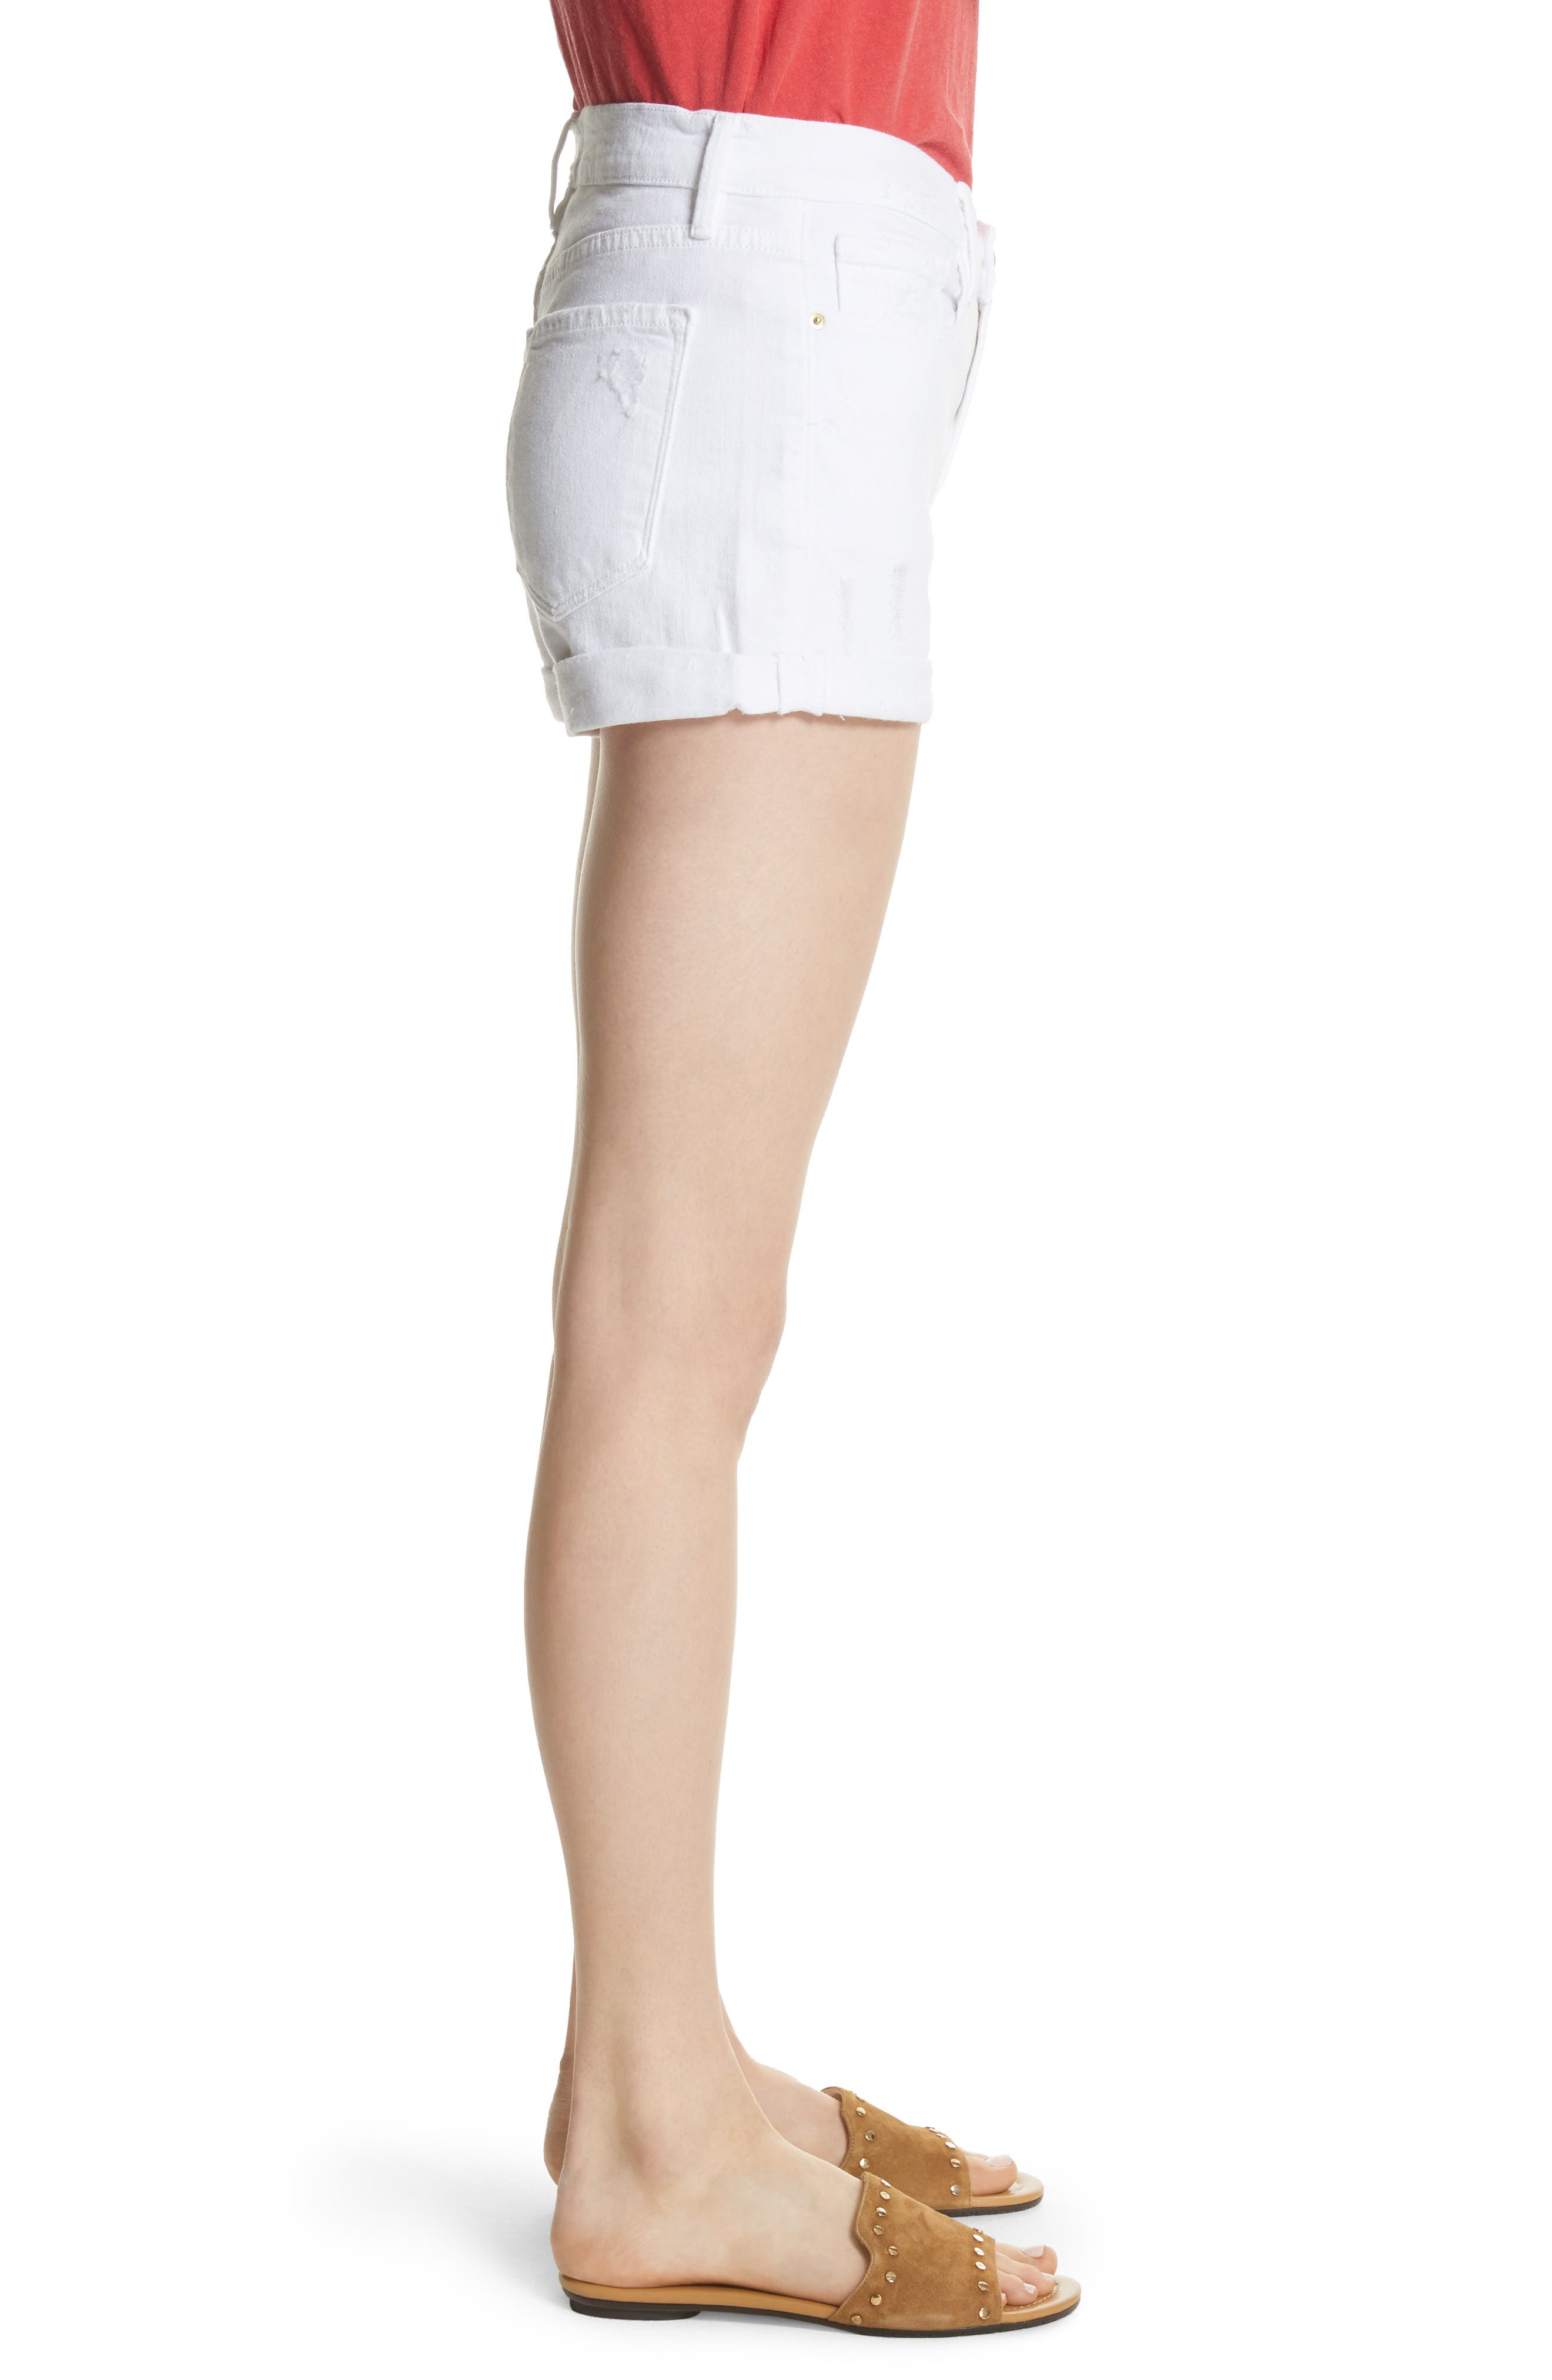 Le Cutoff Cuffed Jean Shorts,                             Alternate thumbnail 3, color,                             BLANC ROOKLEY